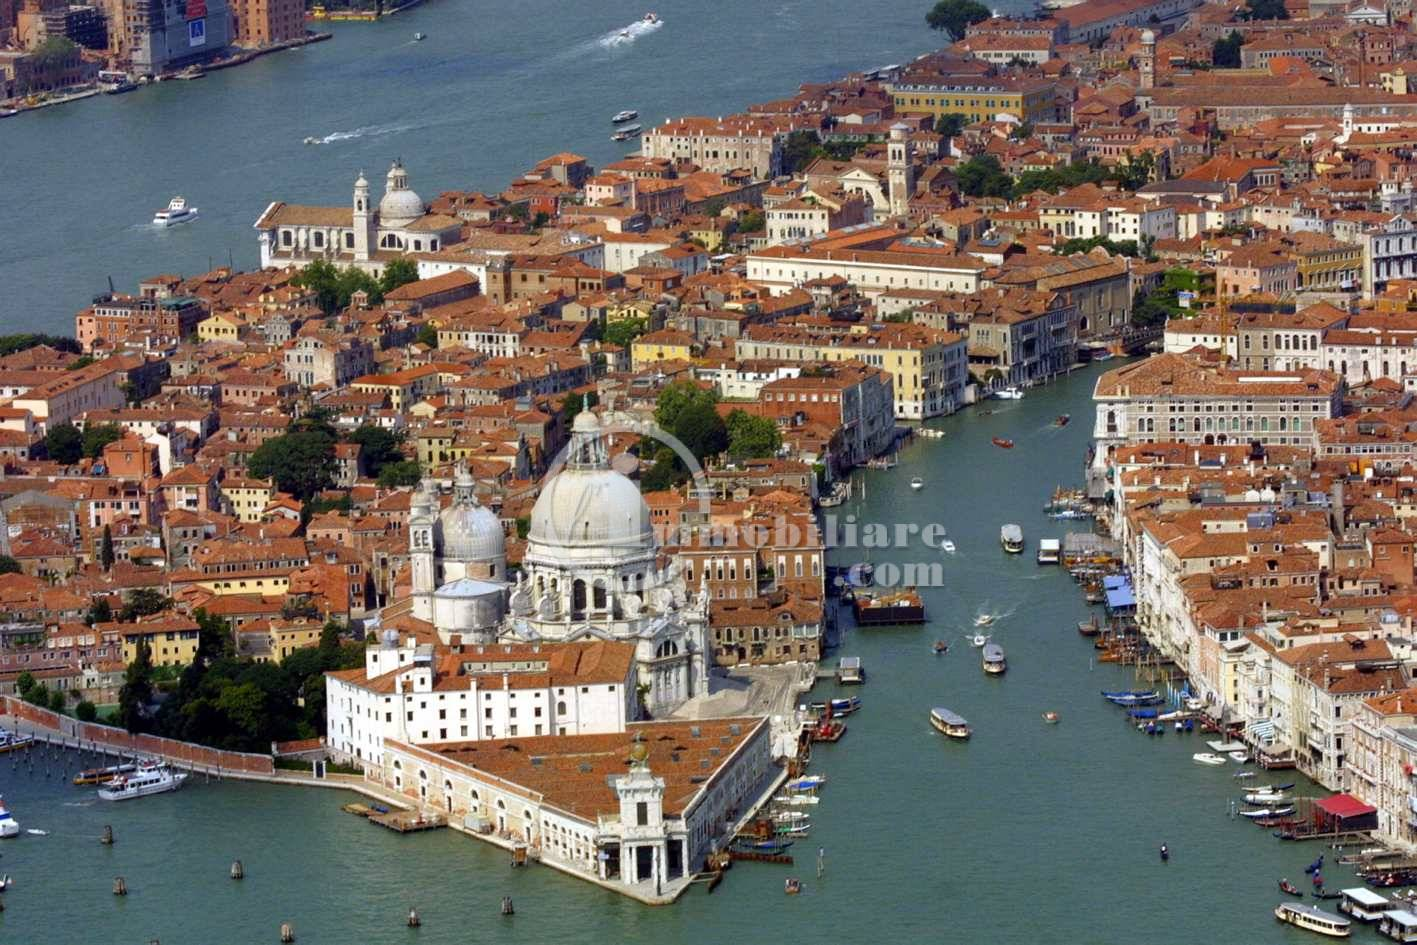 Albergo in Vendita a Venezia: 5 locali, 4750 mq